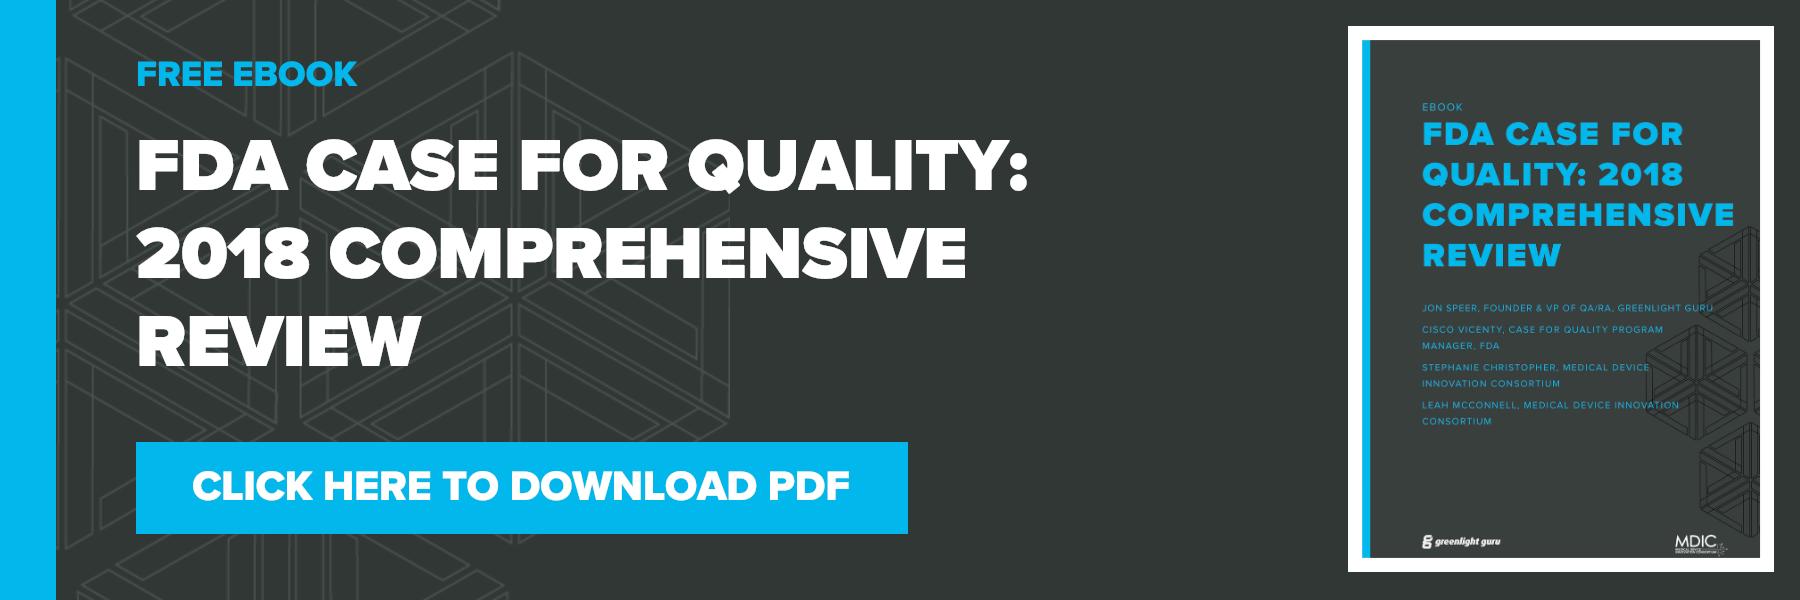 FDA Case for Quality program overview PDF download